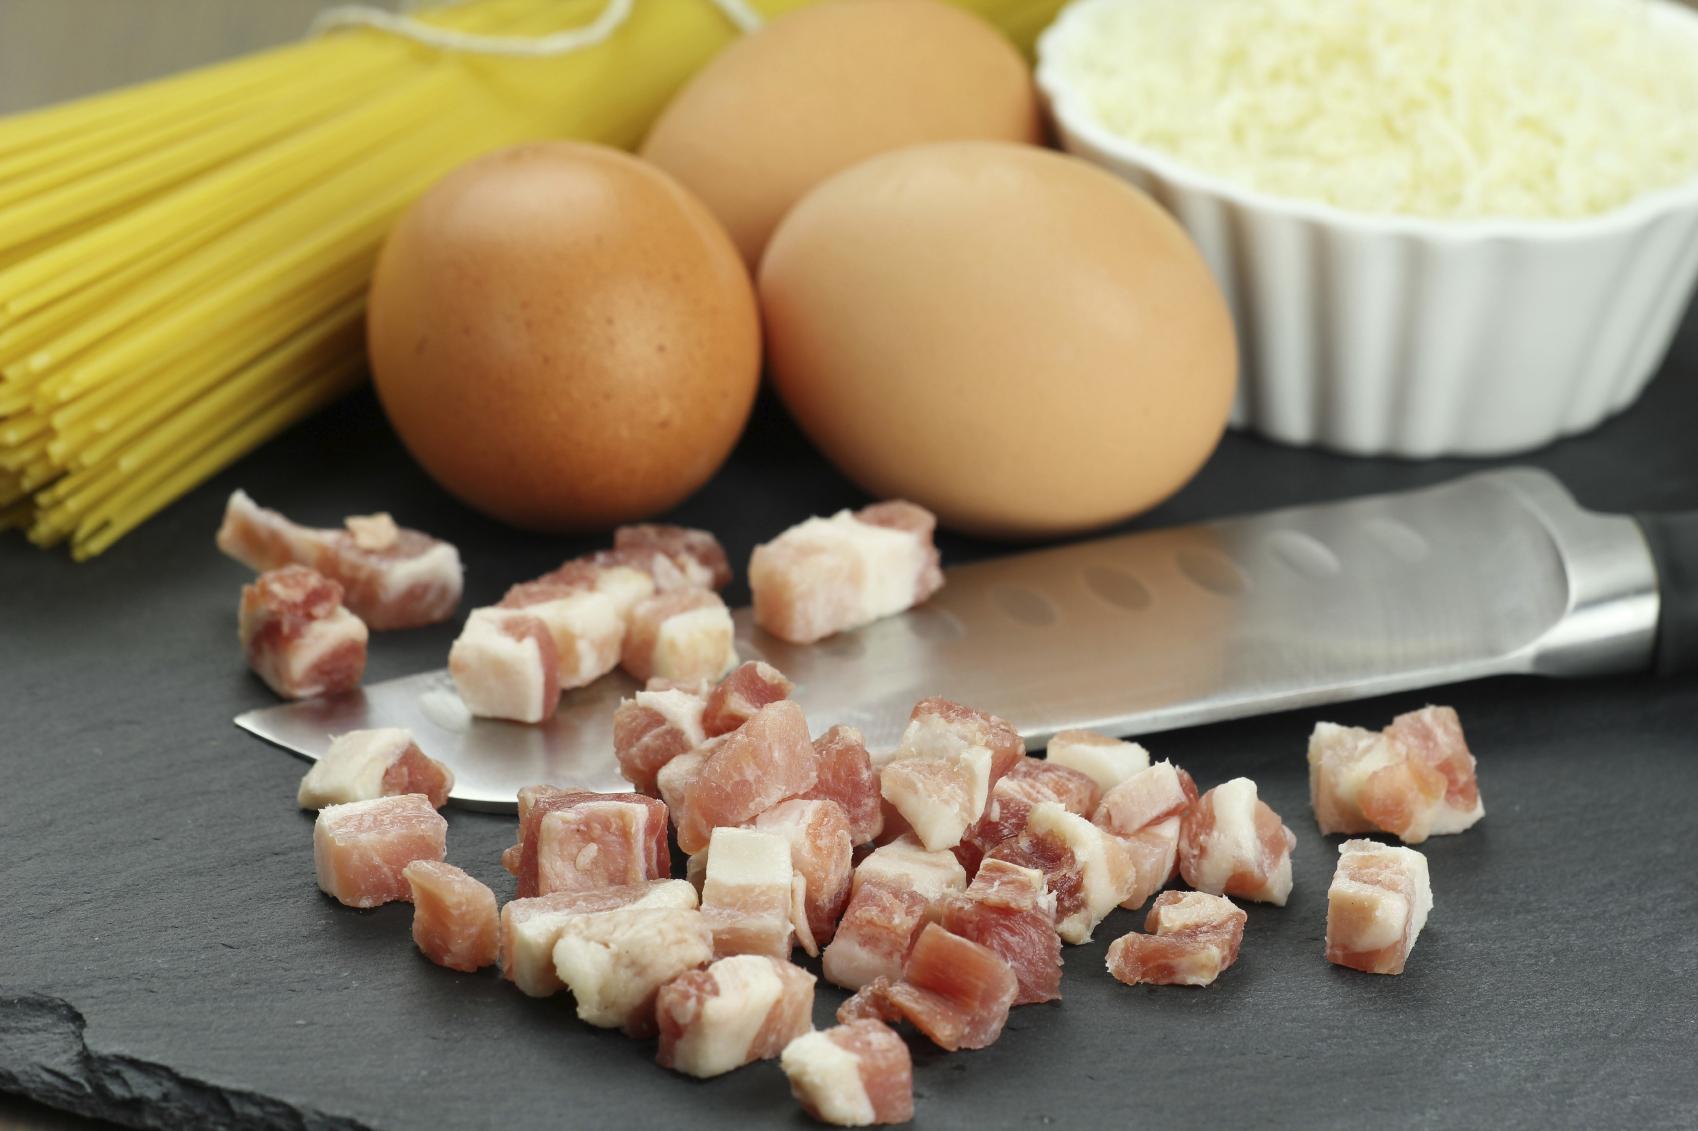 Recipe of eggs and bacon linguini Riċetta: Lingwini bil-bajd u l-bacon